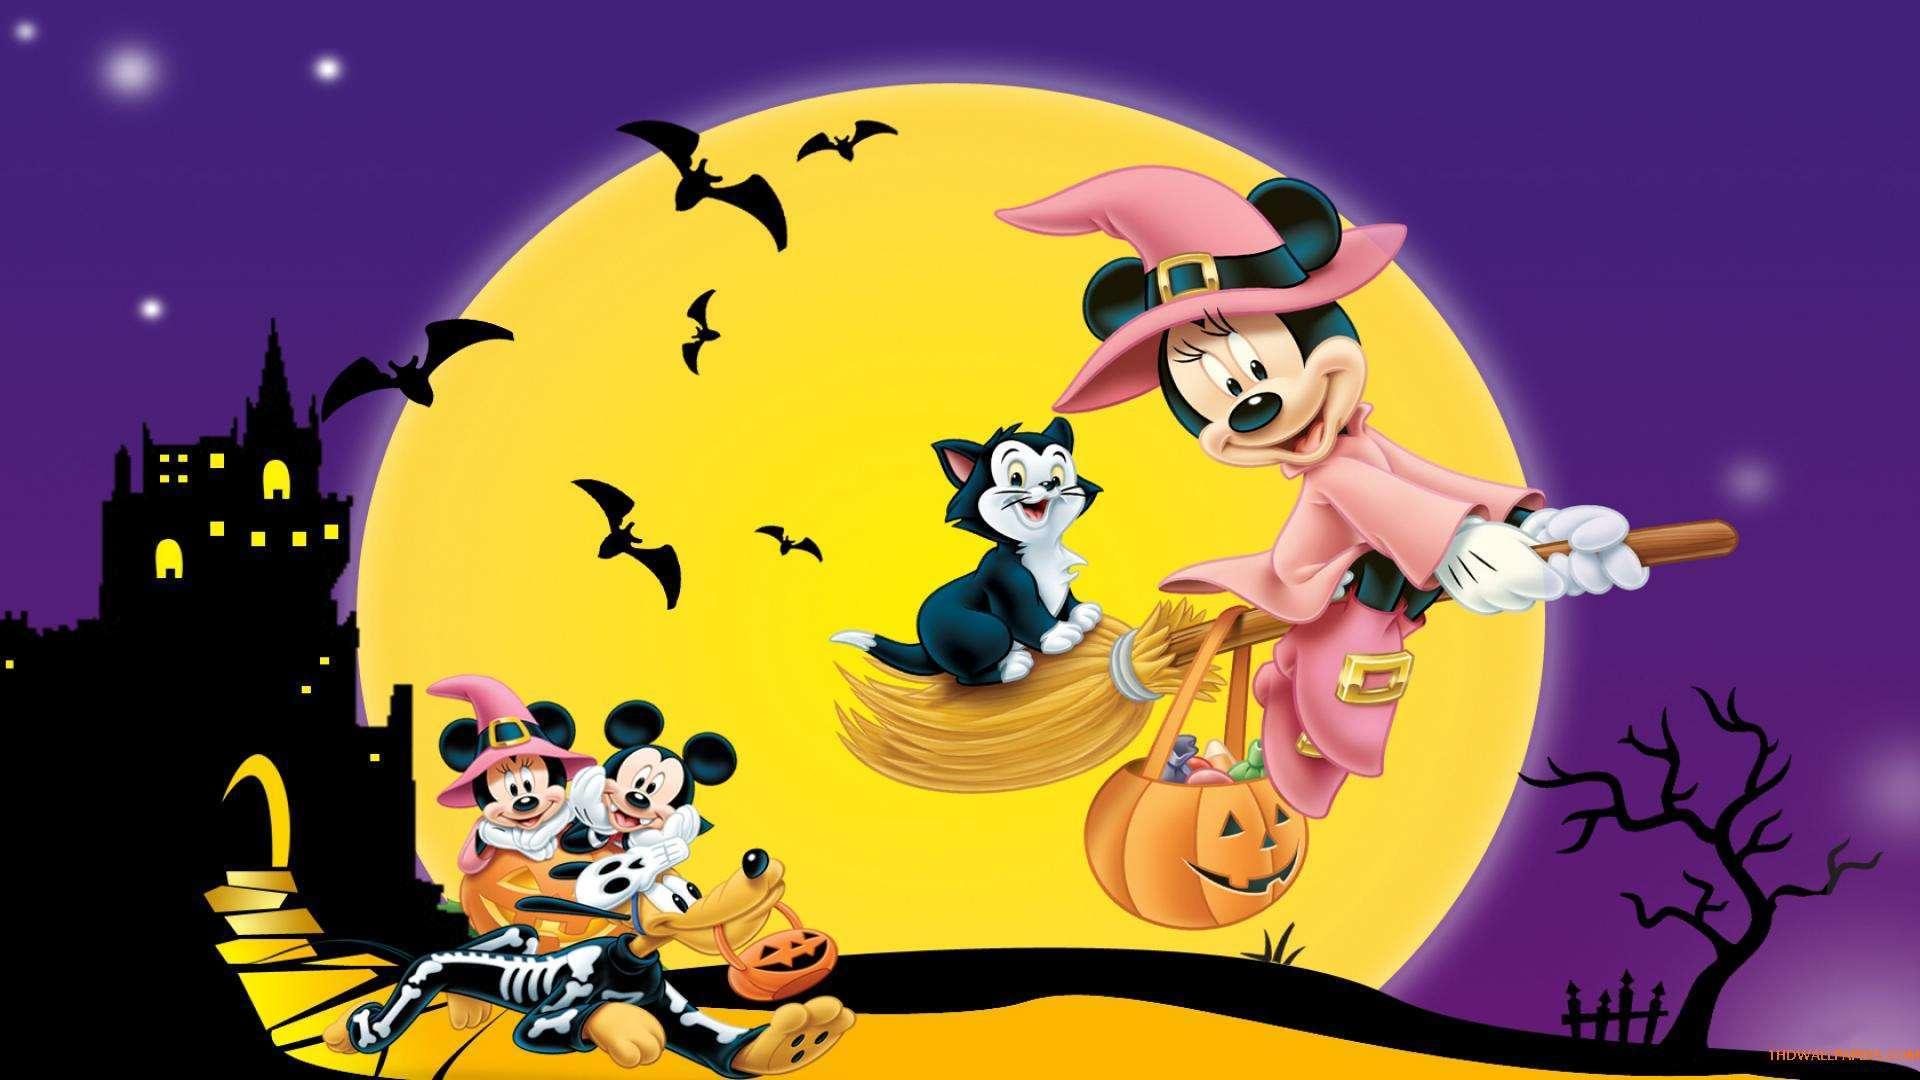 Hd wallpaper sites - Wallpaper Disney Halloween Hd Wallpaper 1080p Upload At August 26